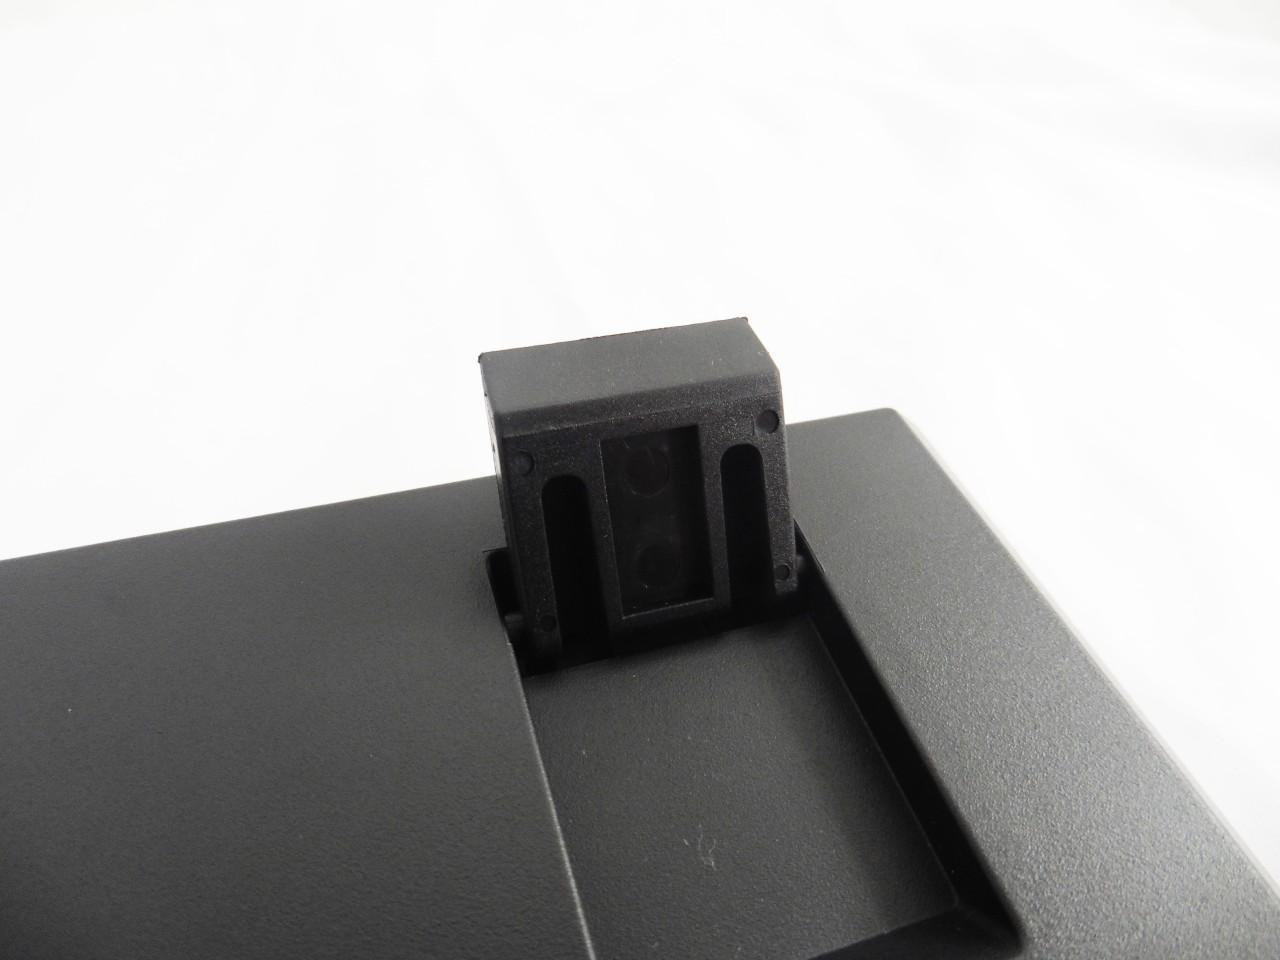 Unboxing & Review: Cooler Master MasterKeys Lite L Keyboard Mouse Combo 107